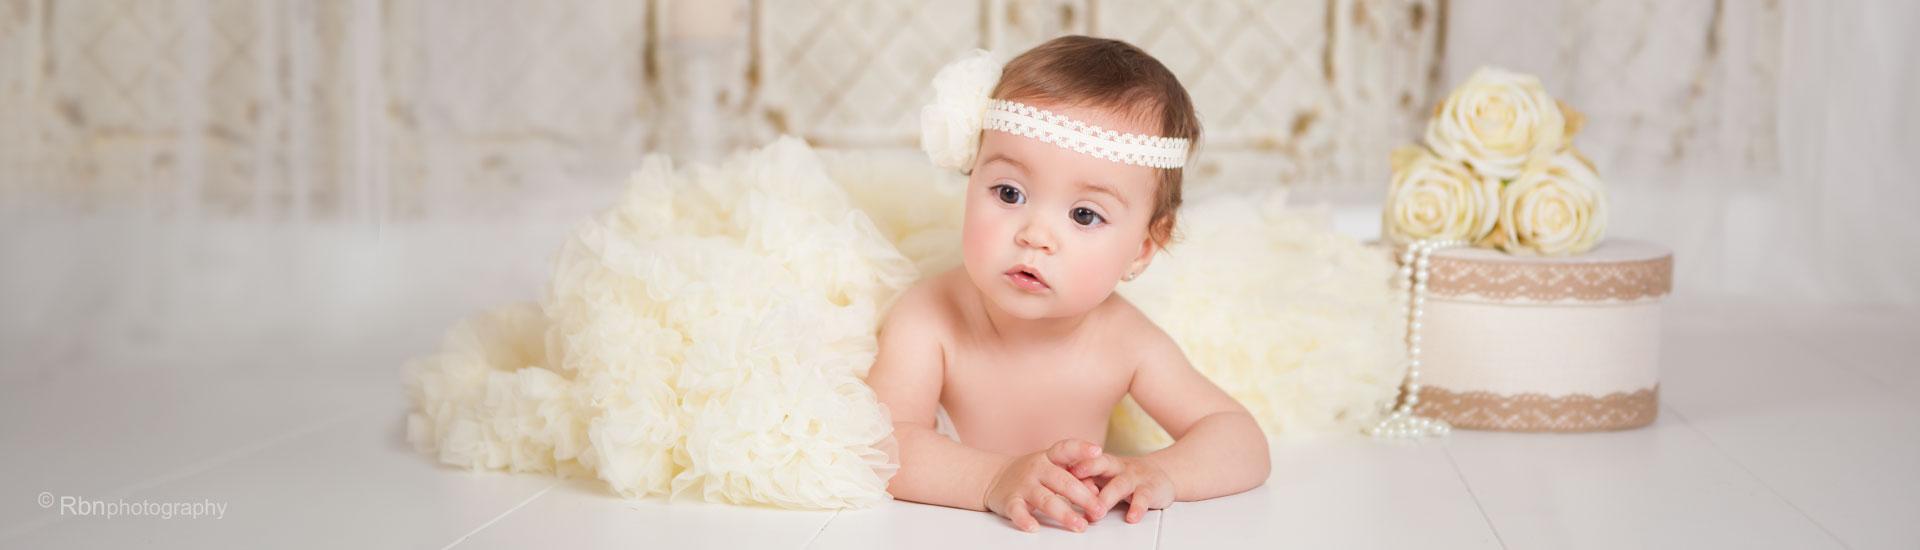 fotografo bebes-fotografo embarazadas-rbnphotography-fotos de estudio de bebes-reportaje fotografico embarazadas-fotografos embarazo